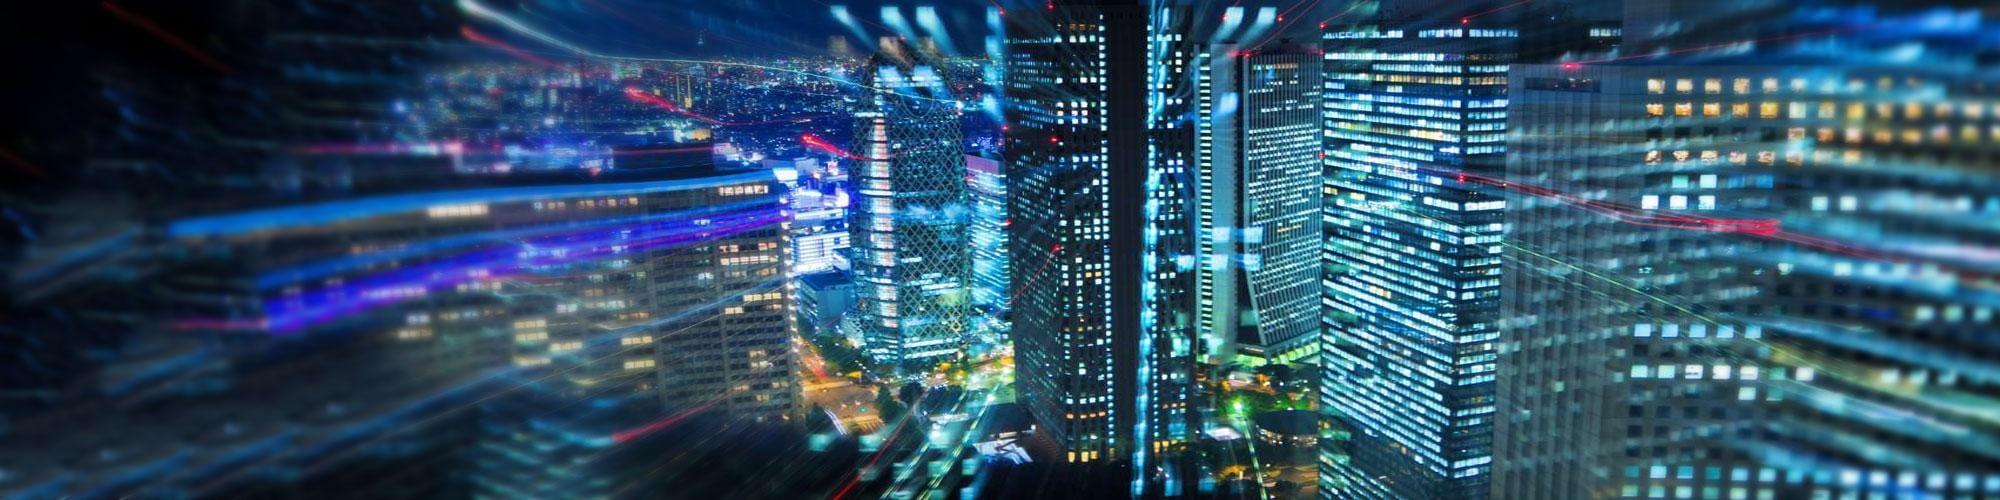 City Lights - defused